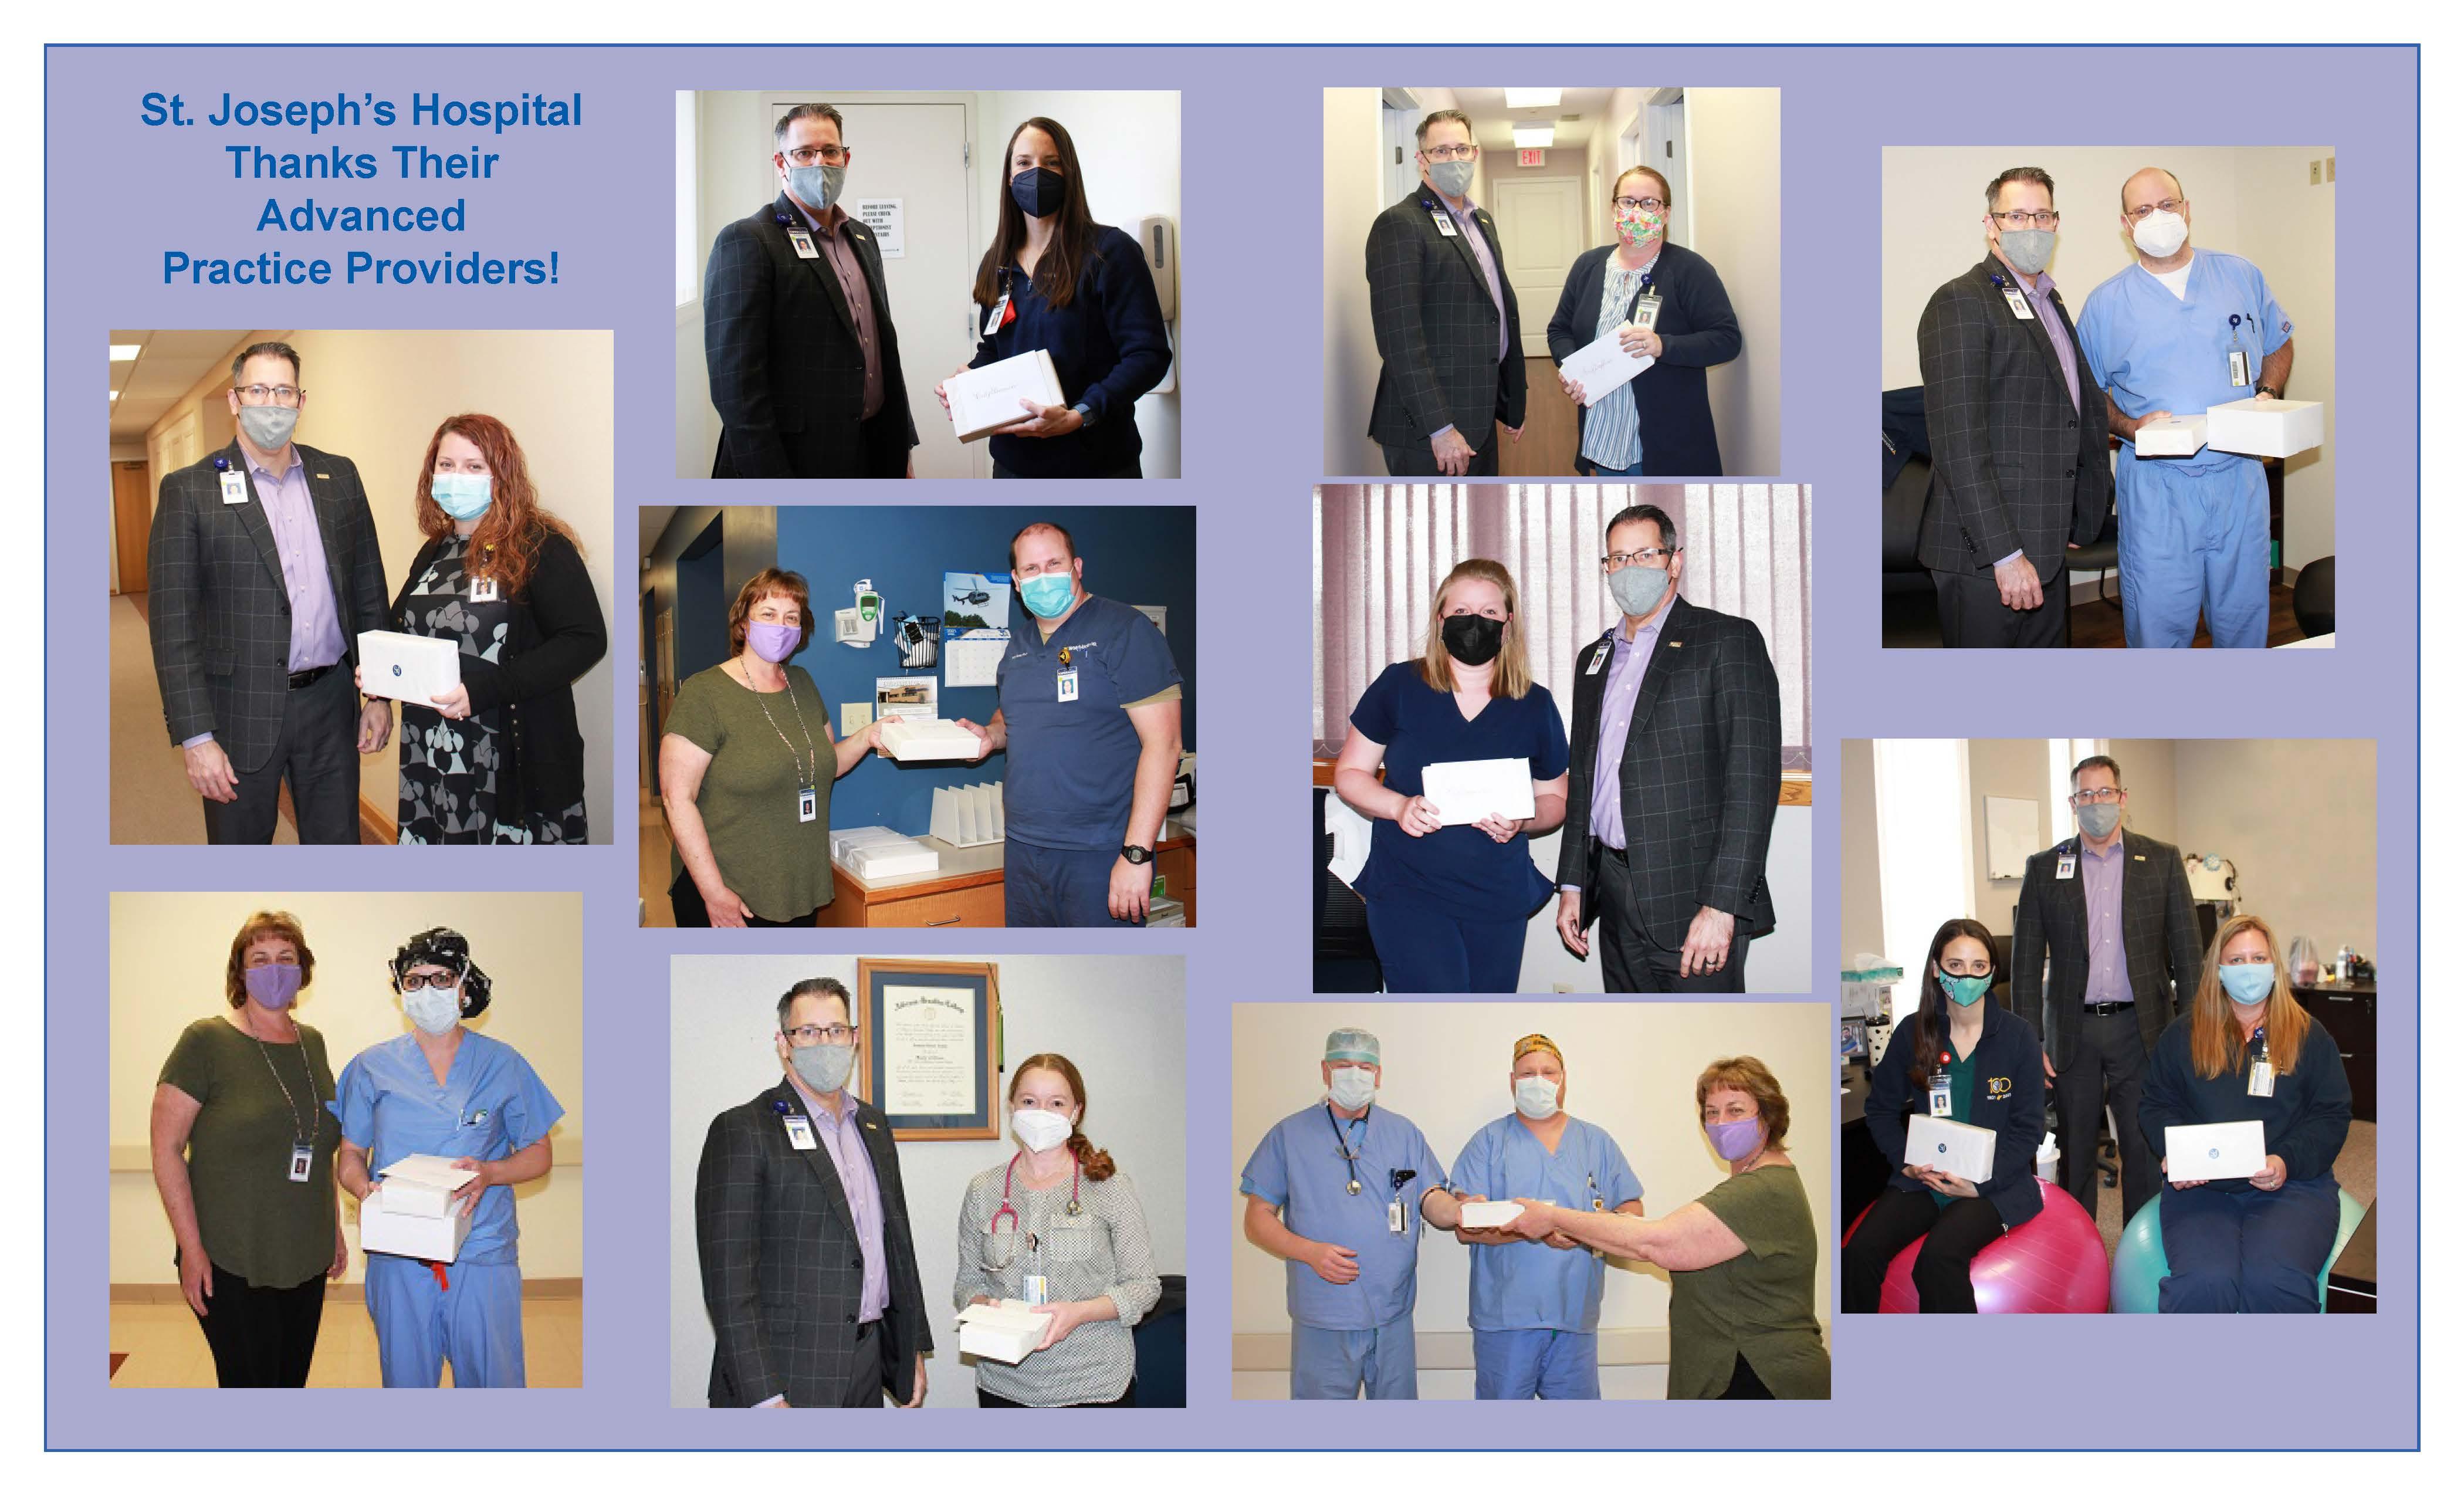 St. Joseph's Hospital recognizes advanced practice providers